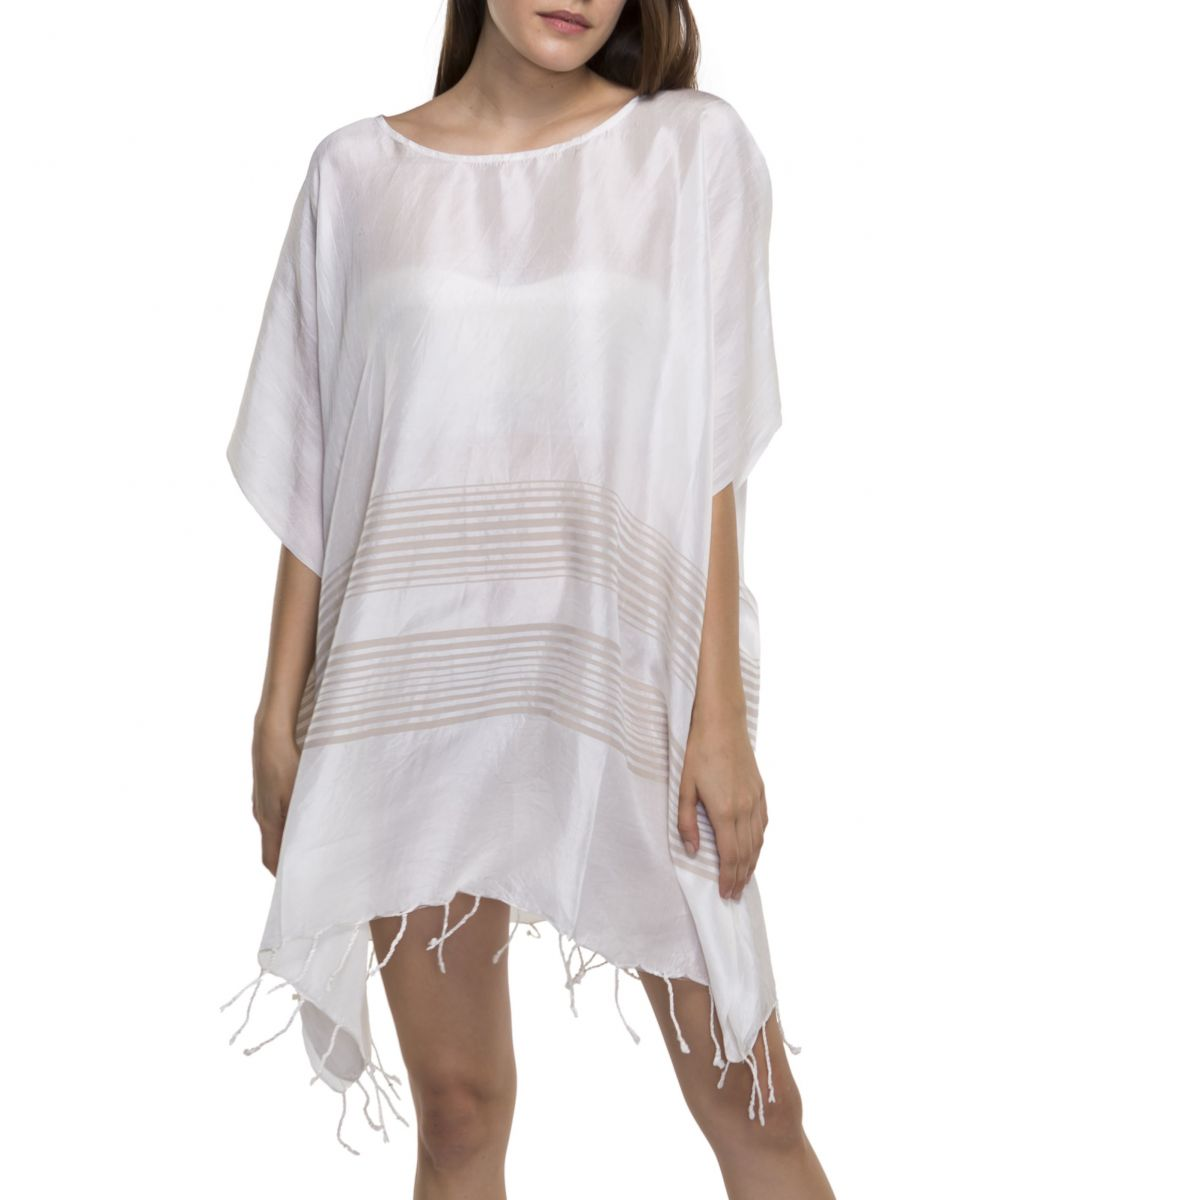 Tunic / Dress Silk - Taupe Stripes